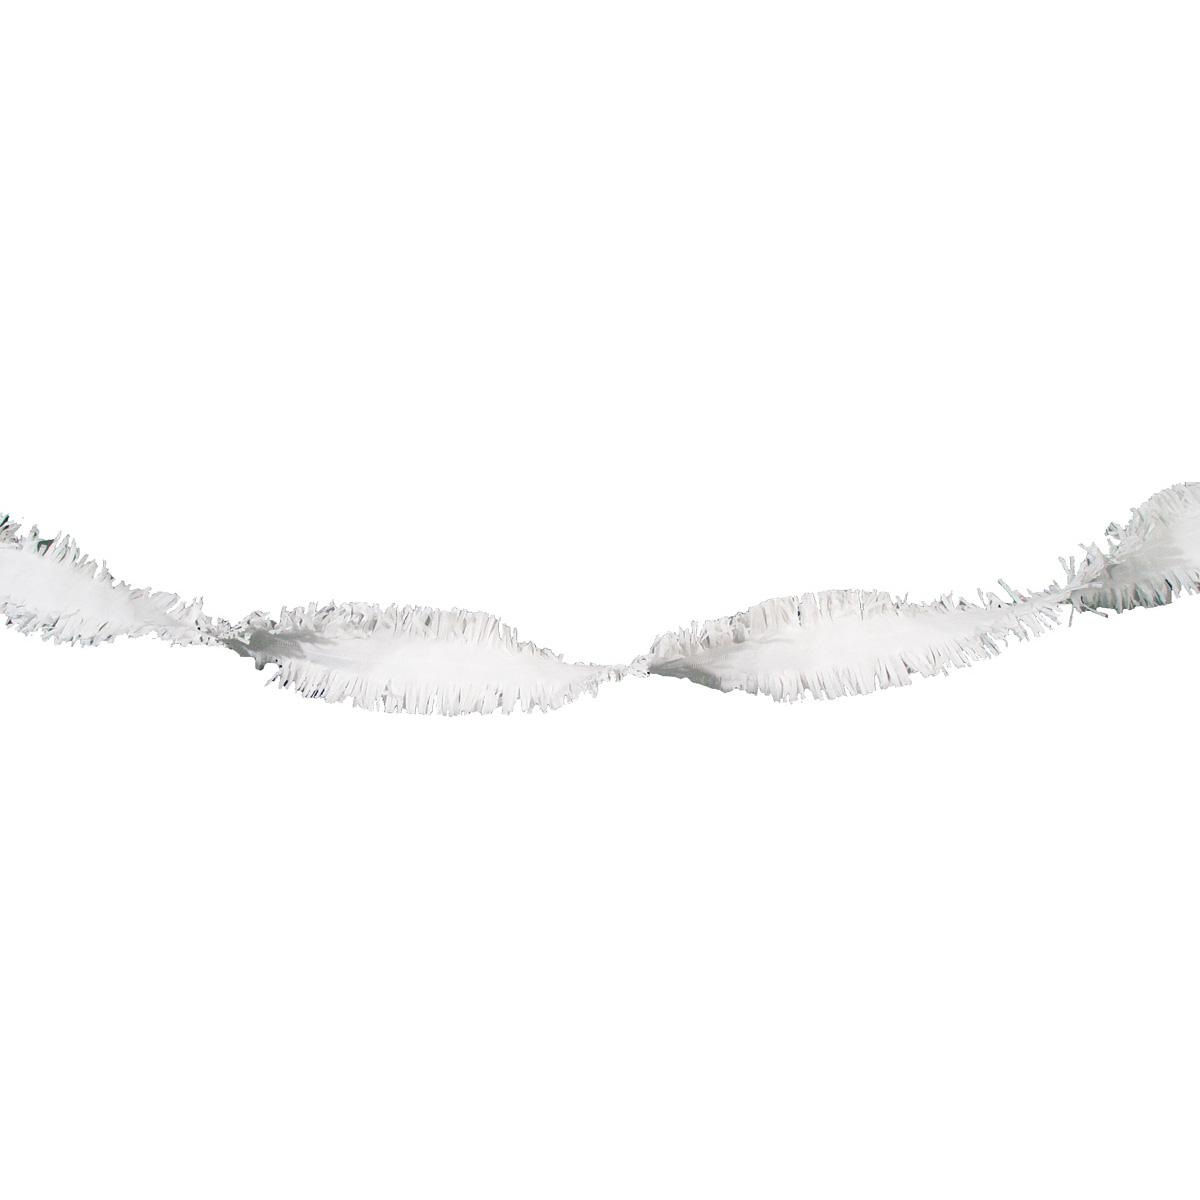 Girlang kräppapper, vit